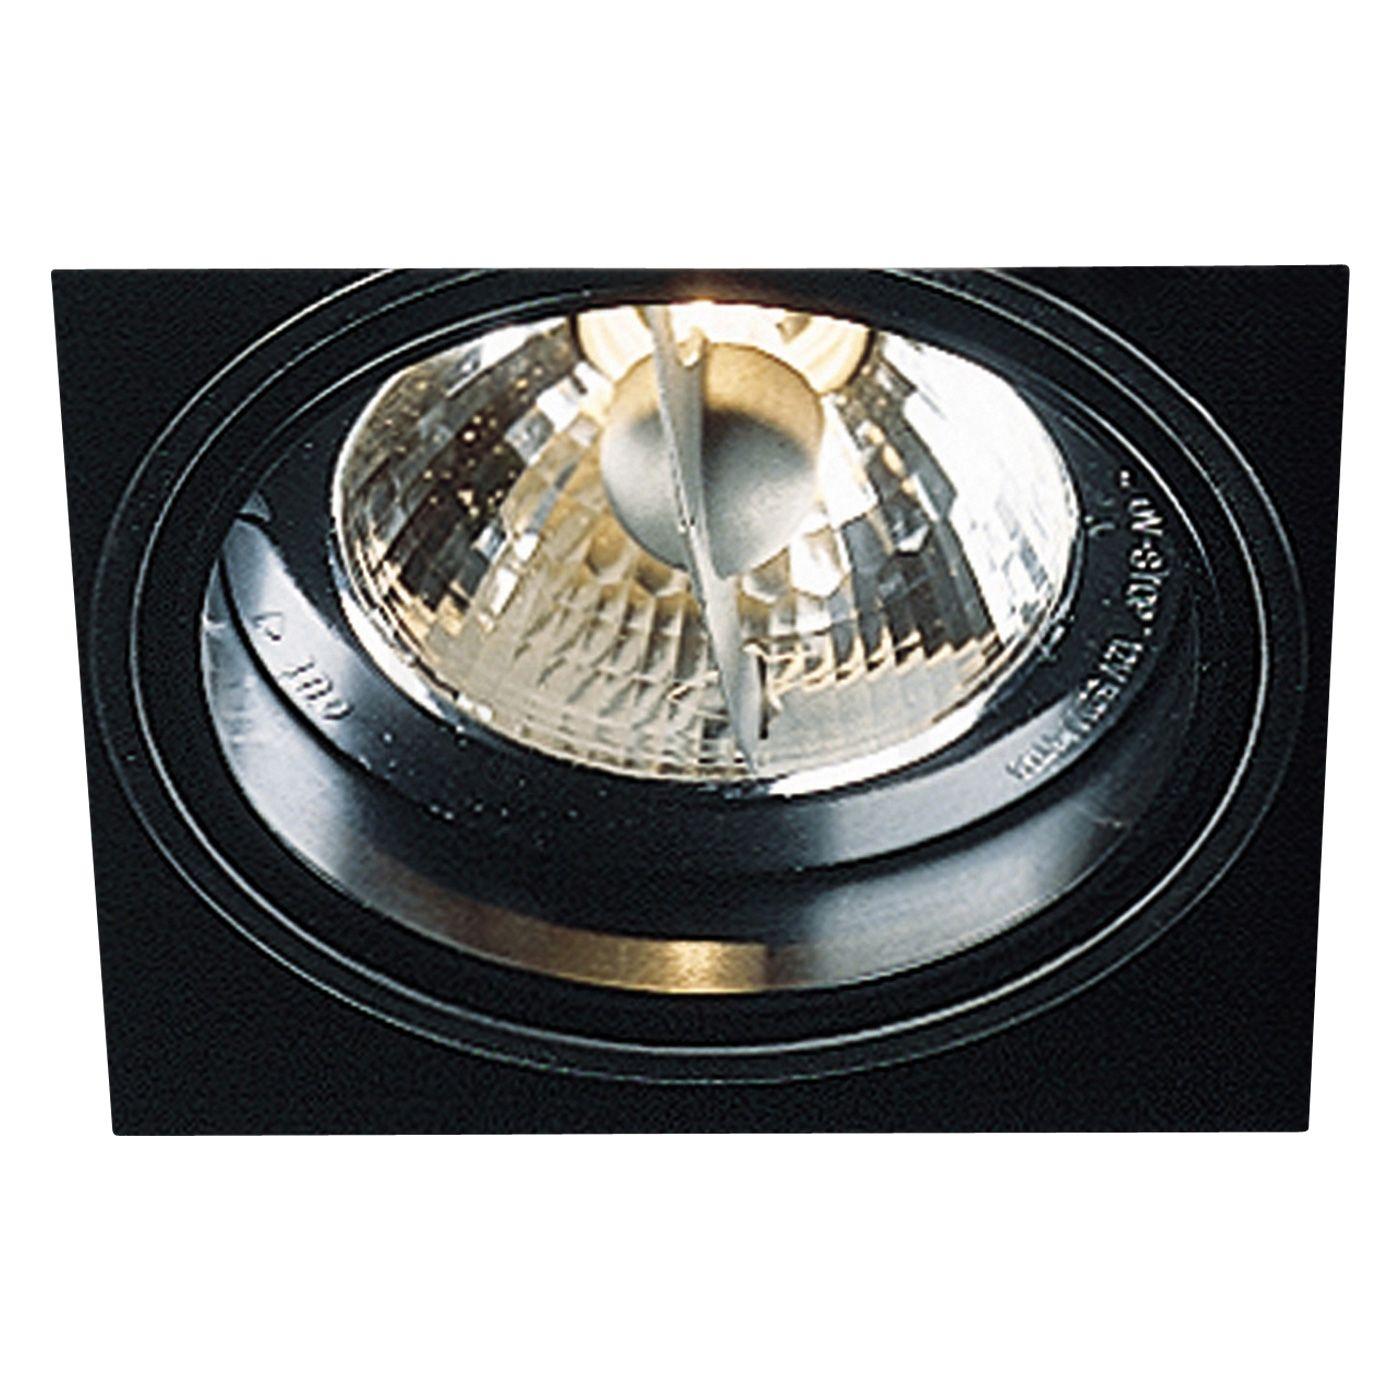 delta light minigrid in trimless 1 qr einbaustrahler. Black Bedroom Furniture Sets. Home Design Ideas